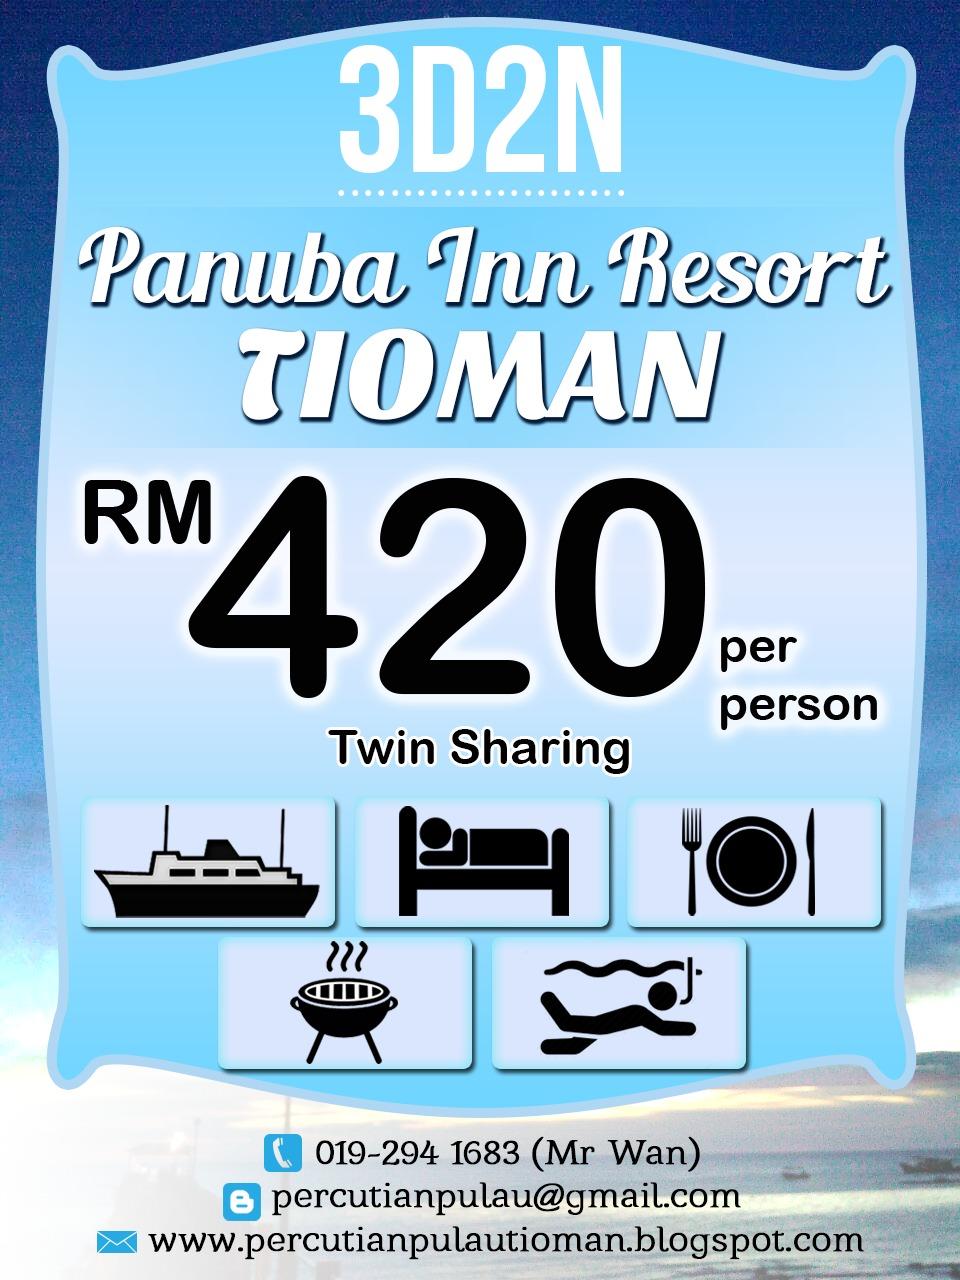 PANUBA INN RESORT